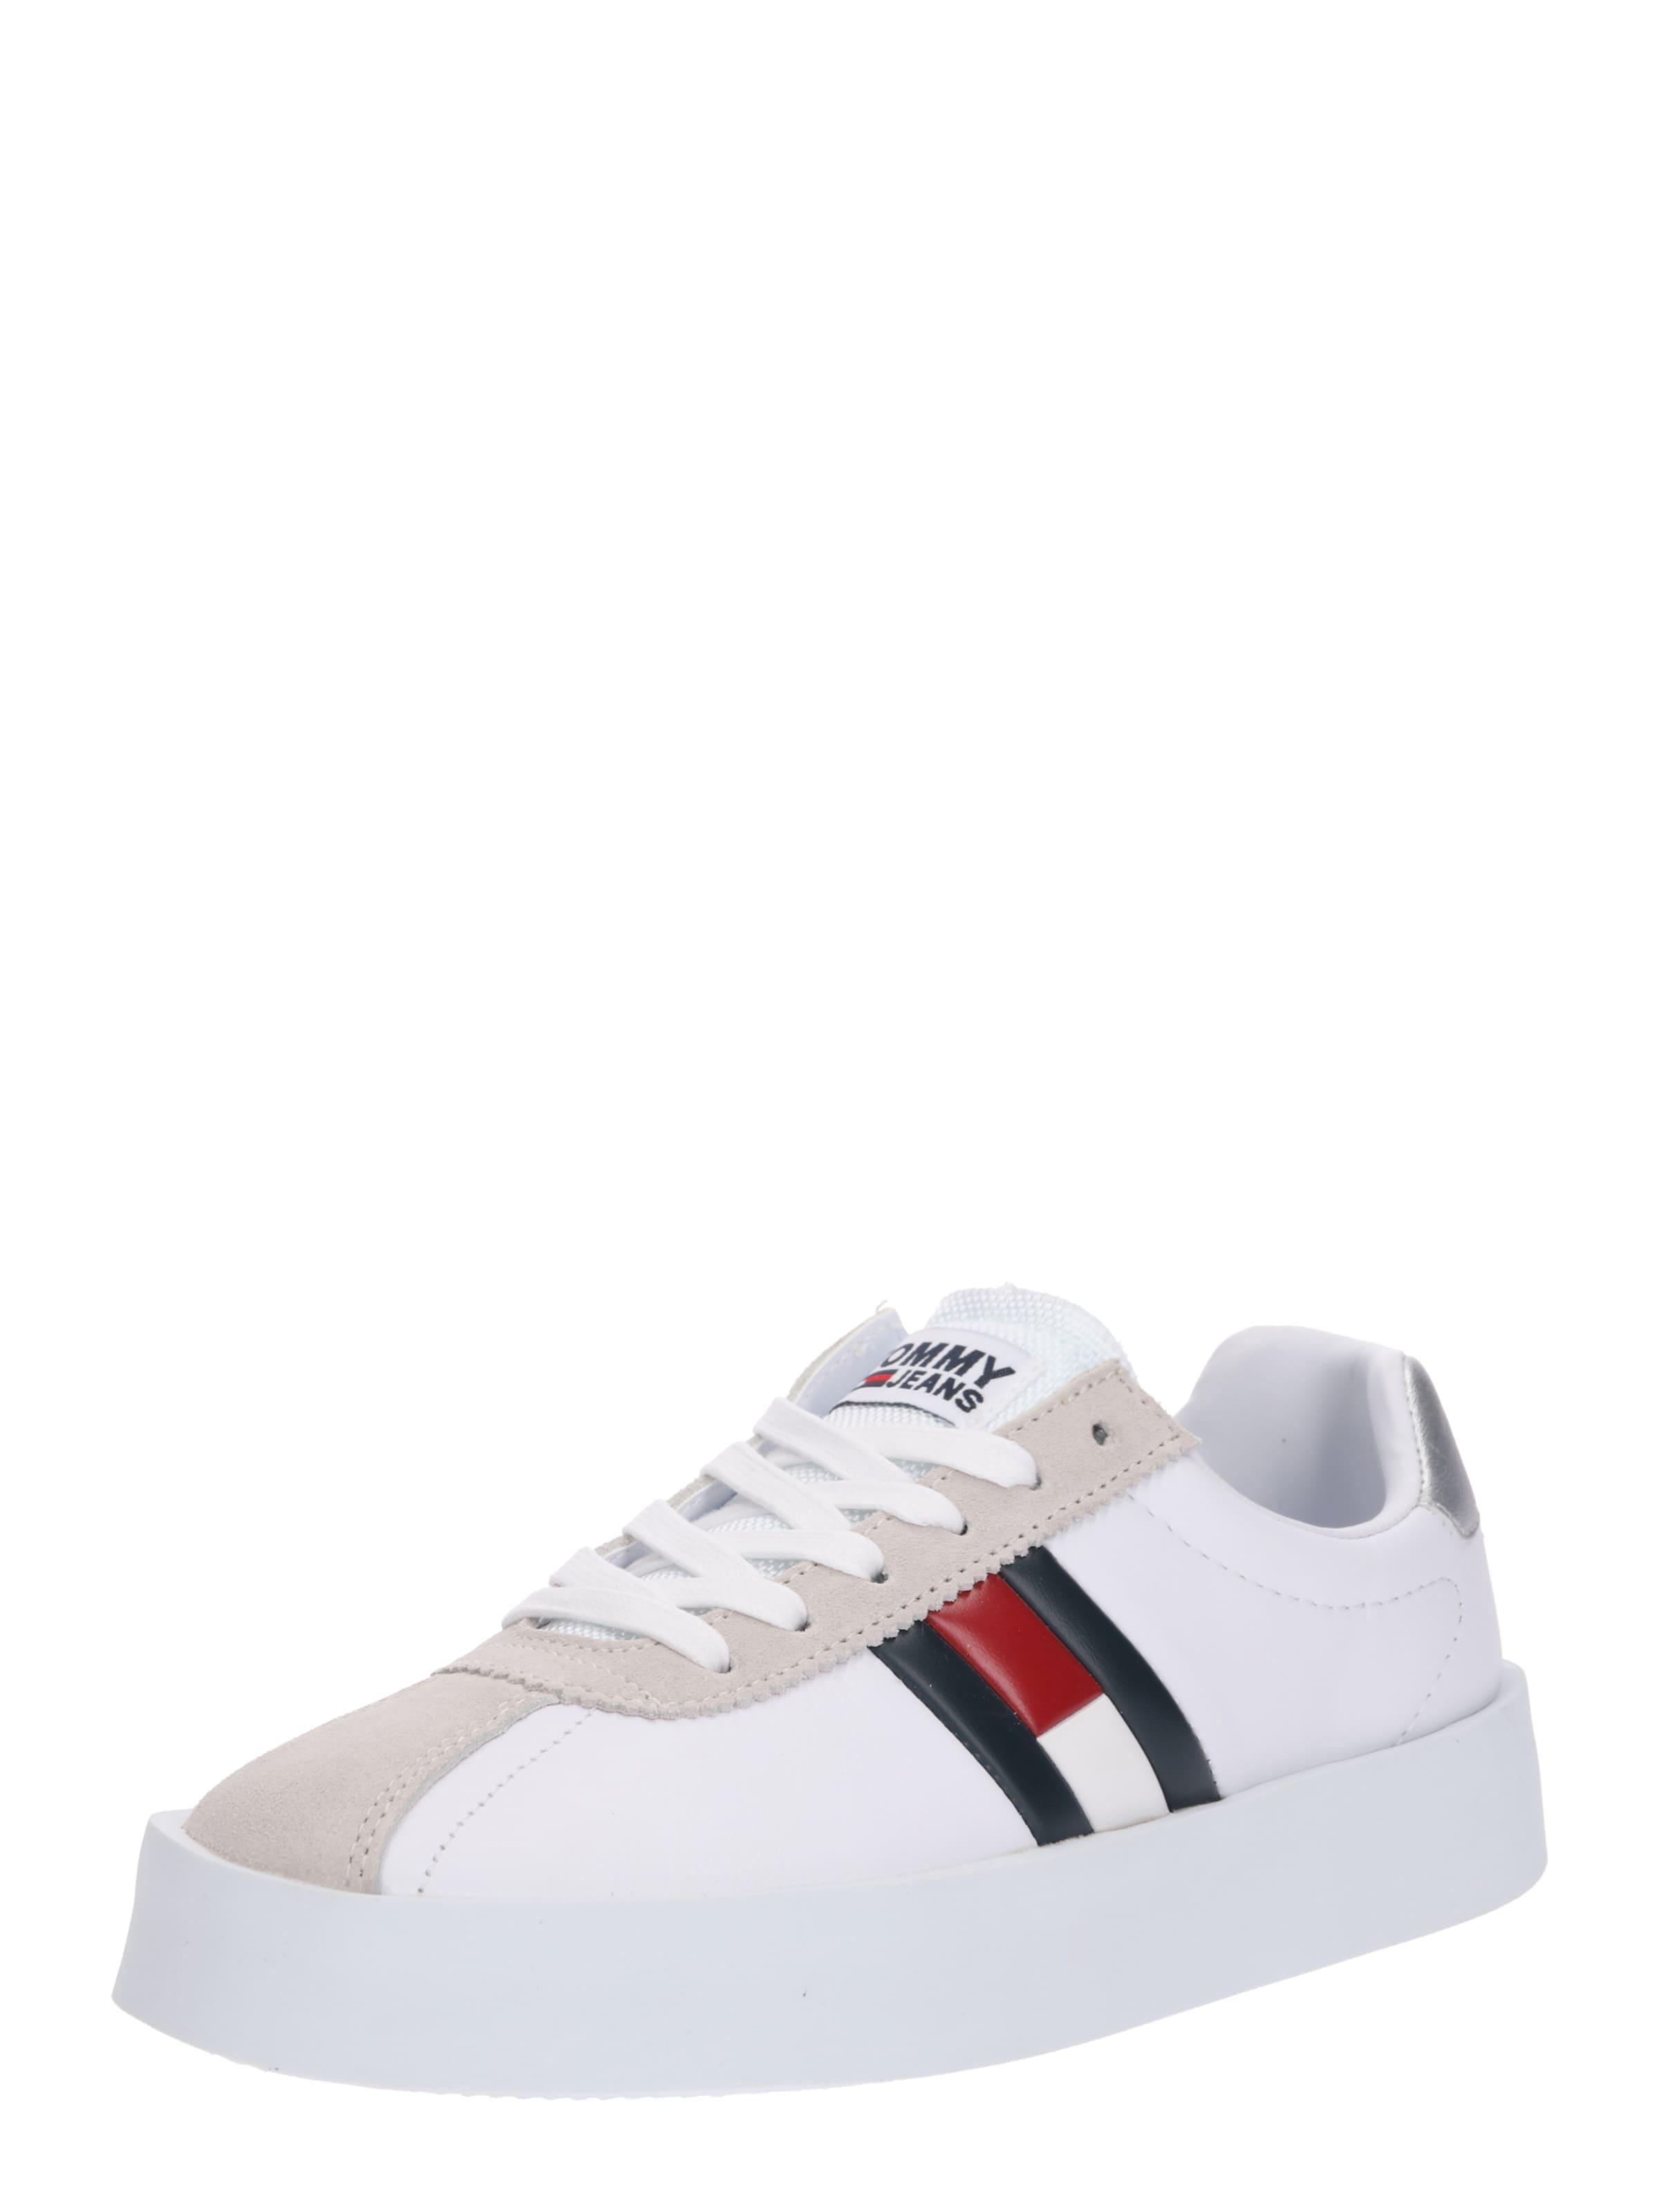 Tommy Jeans Sneaker RETRO LIGHT Hohe Qualität